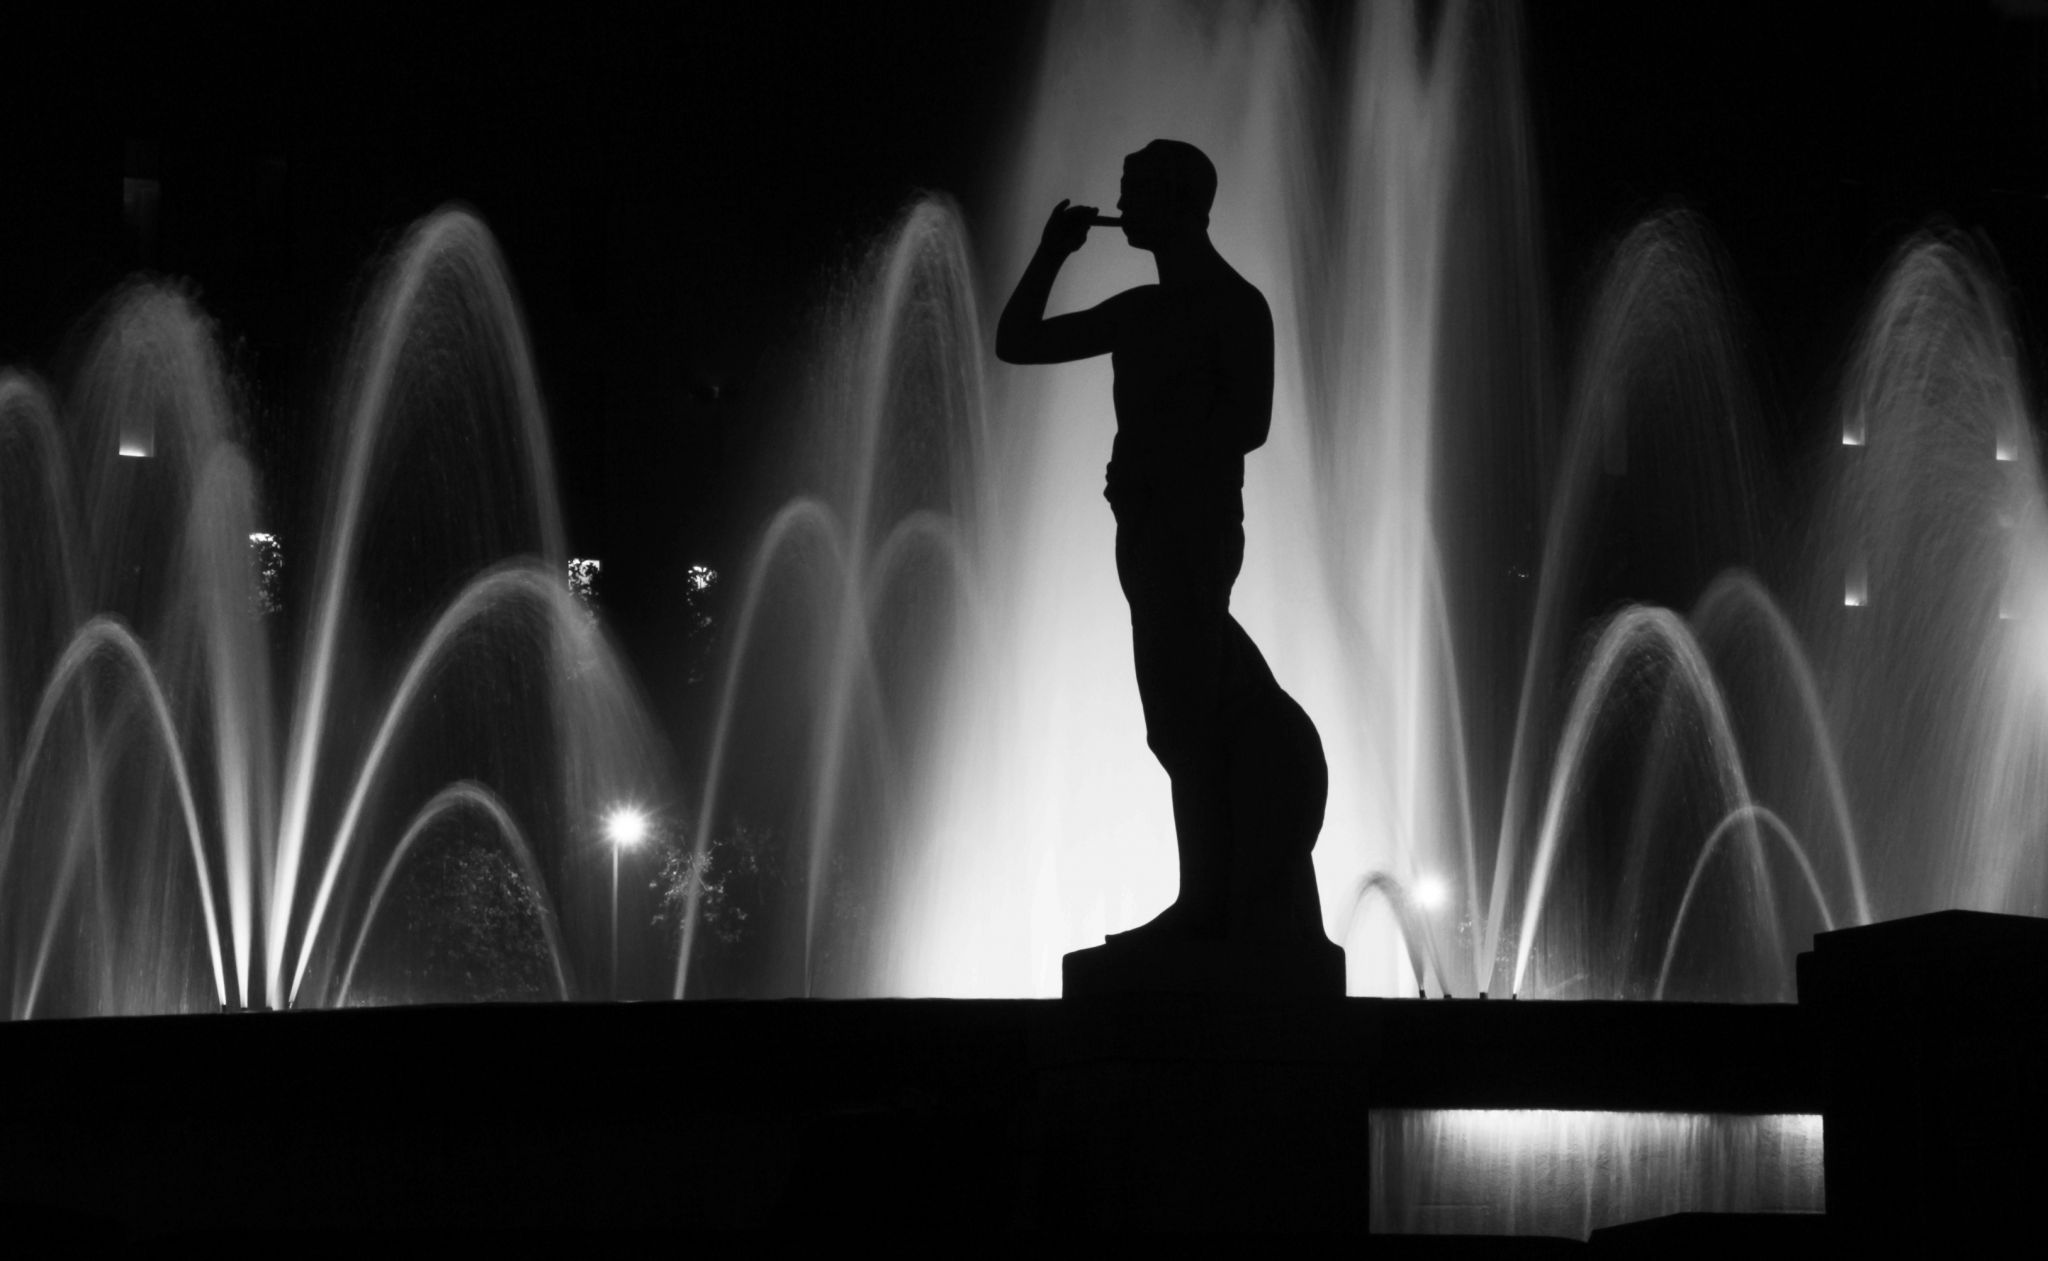 Statue @ Placa Catalunya, Spain